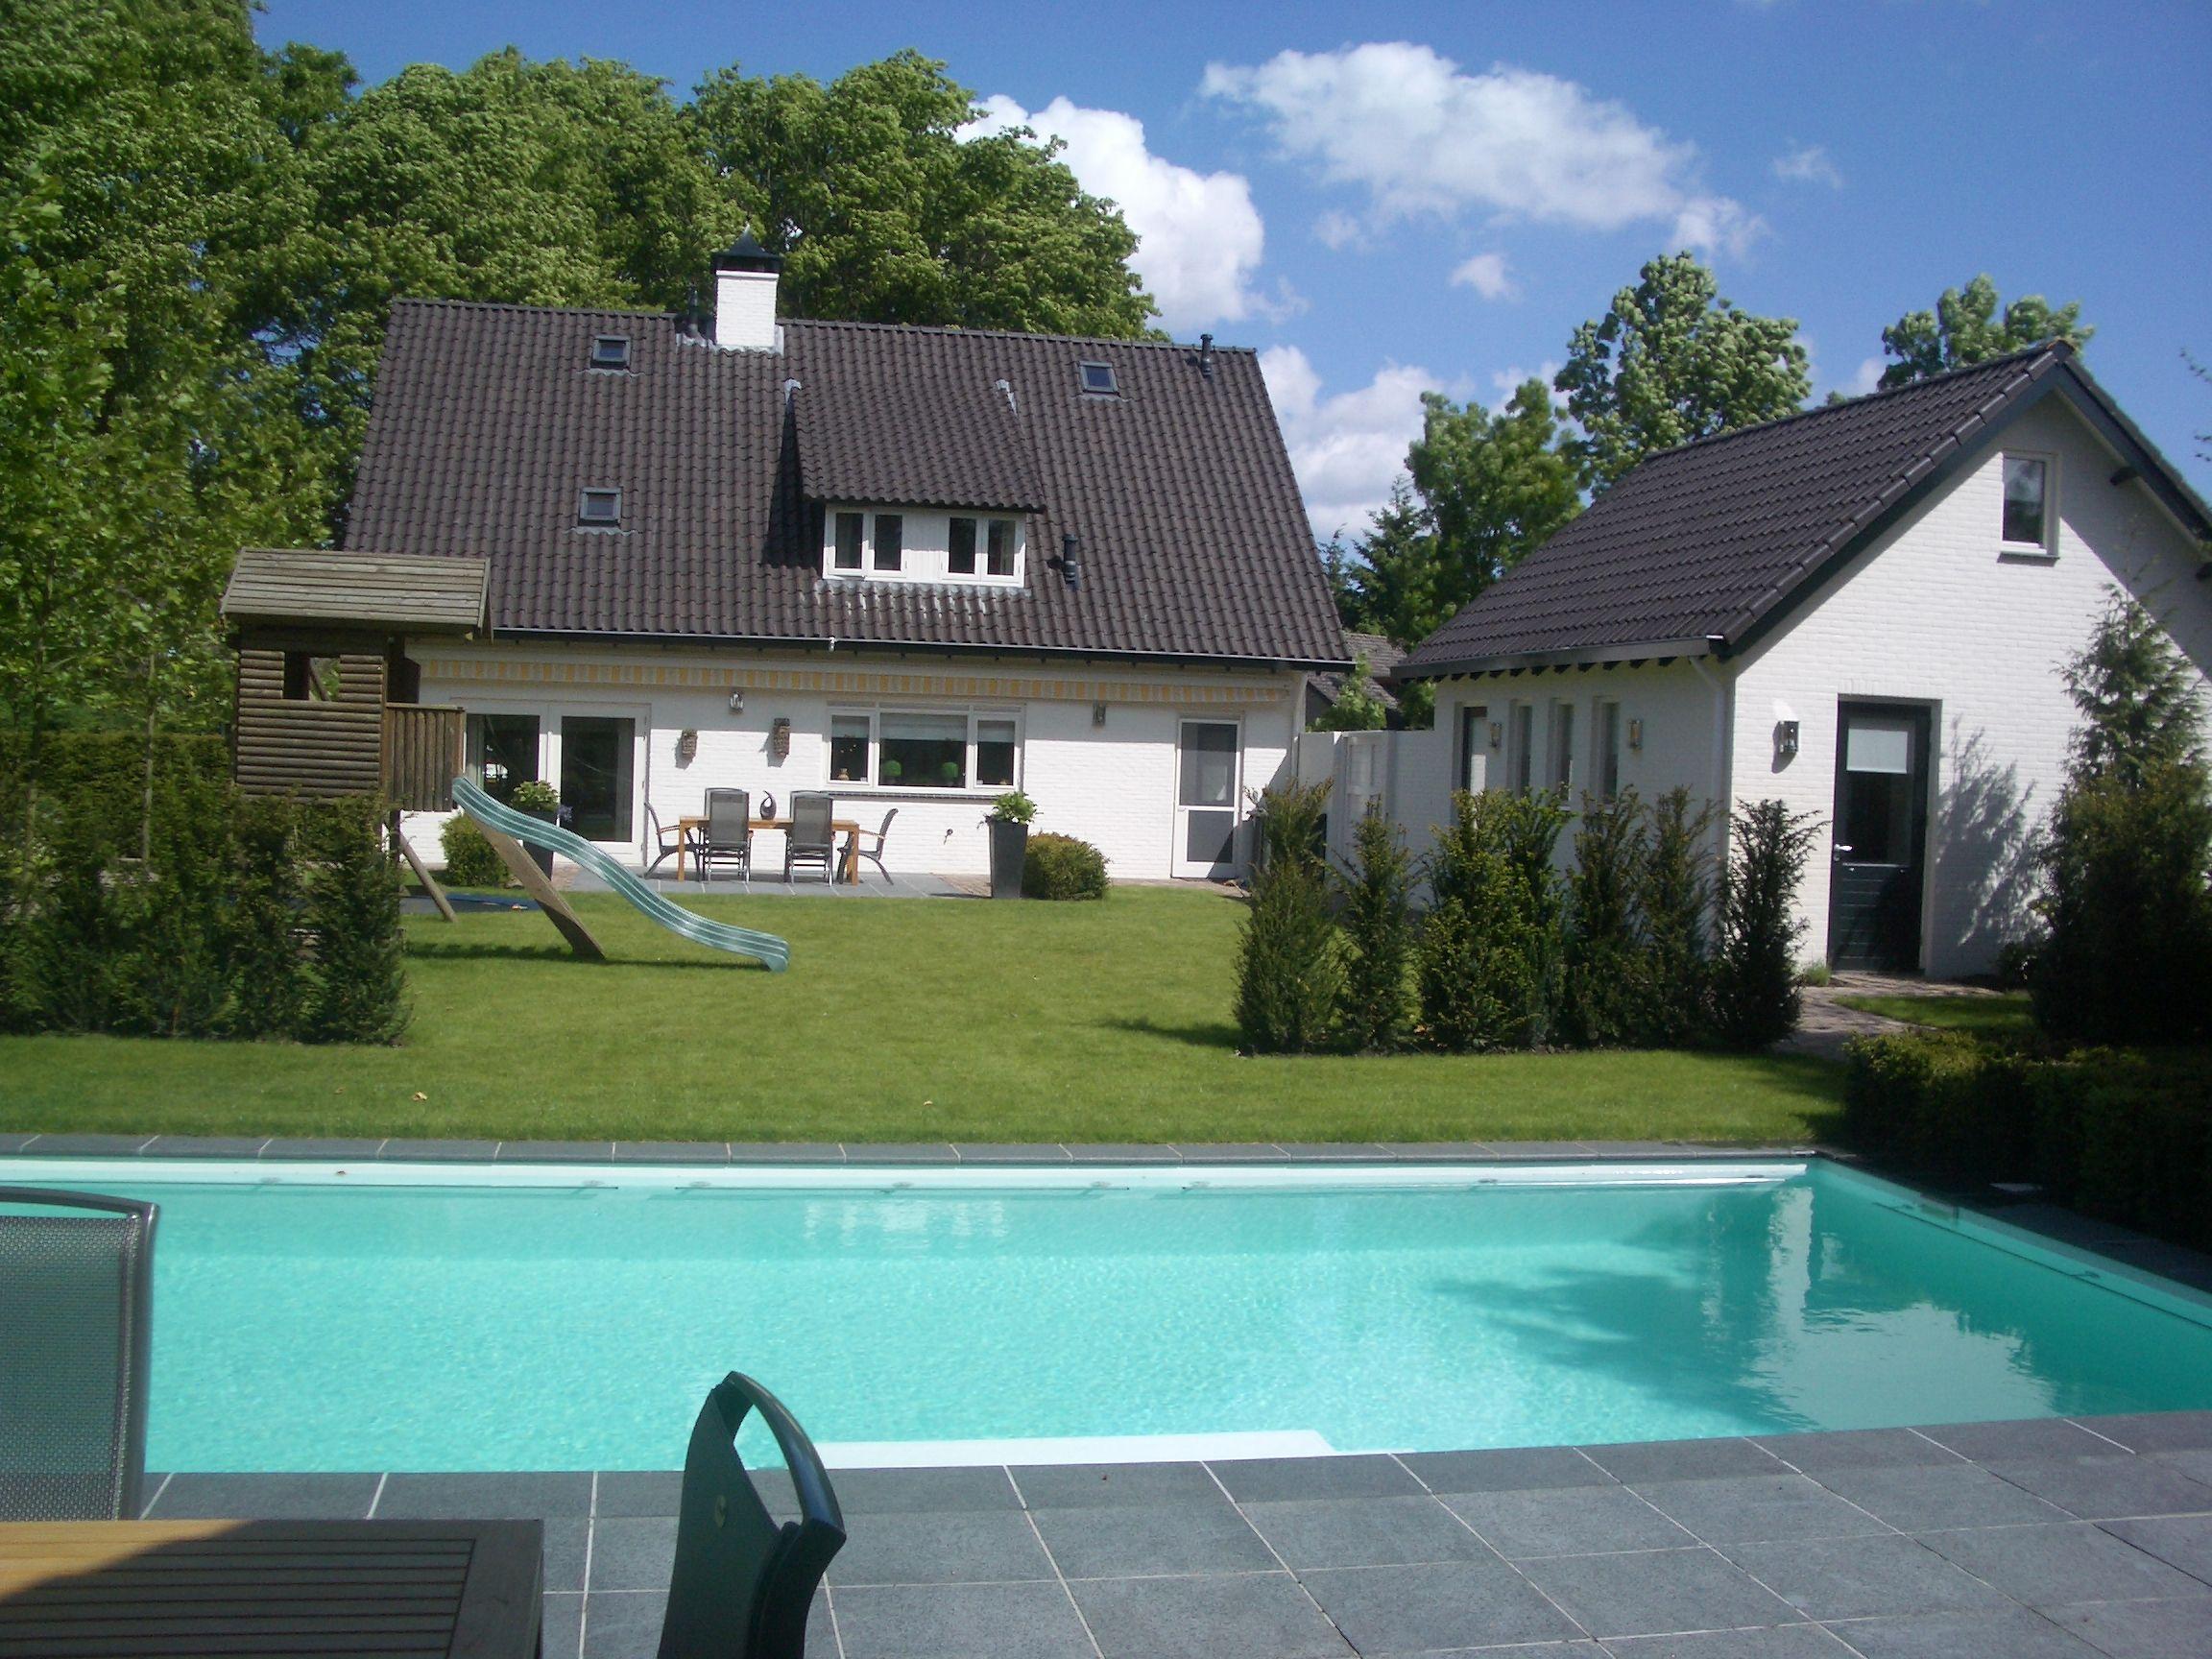 Mooi zwembad in grote tuin met witte folie ook dit for Tuin met zwembad